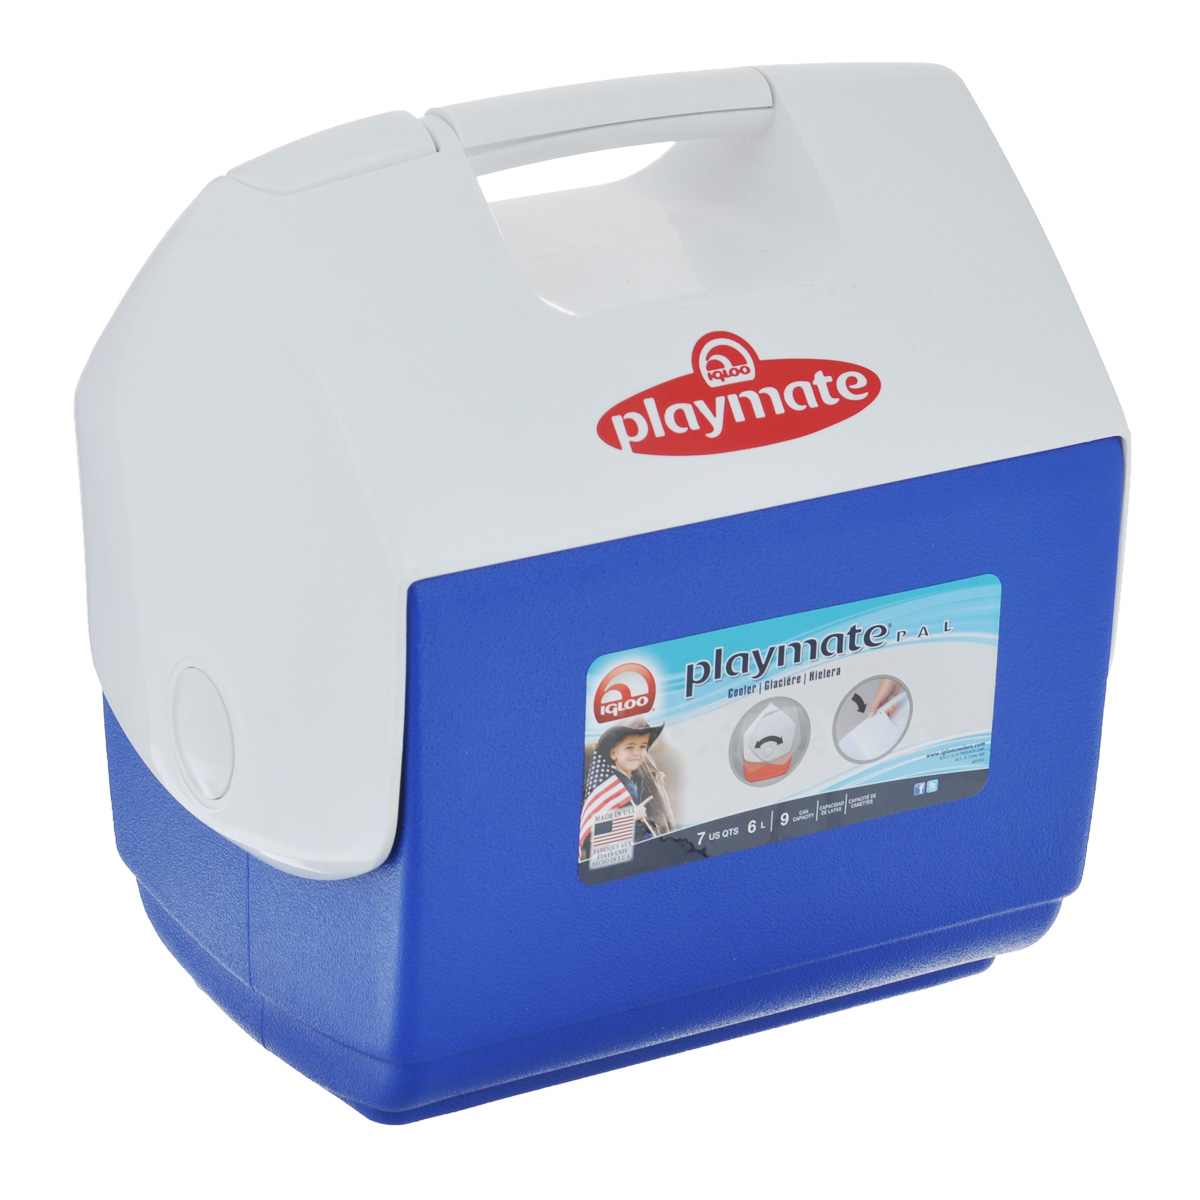 "Изотермический контейнер Igloo ""Playmate Pal"", цвет: синий, 6 л"